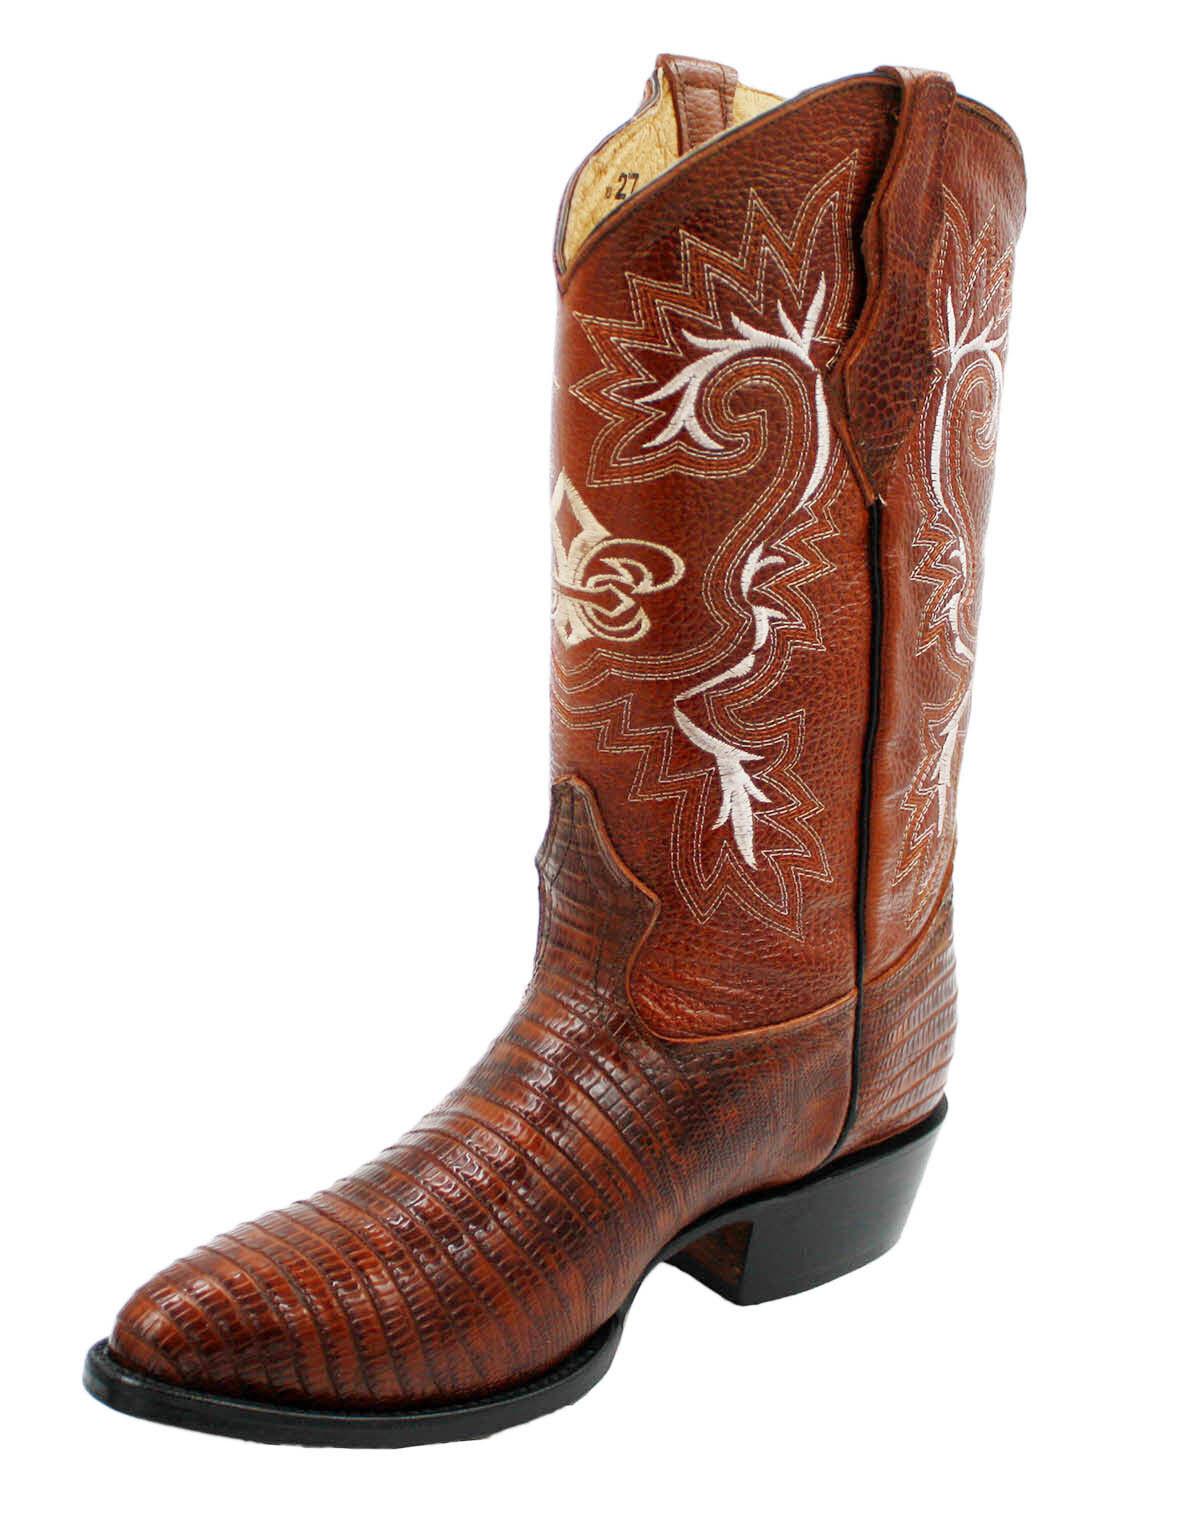 Men's Genuine Leather Lizard Print Western Cowboy Brown Boot  Style CB Lizard